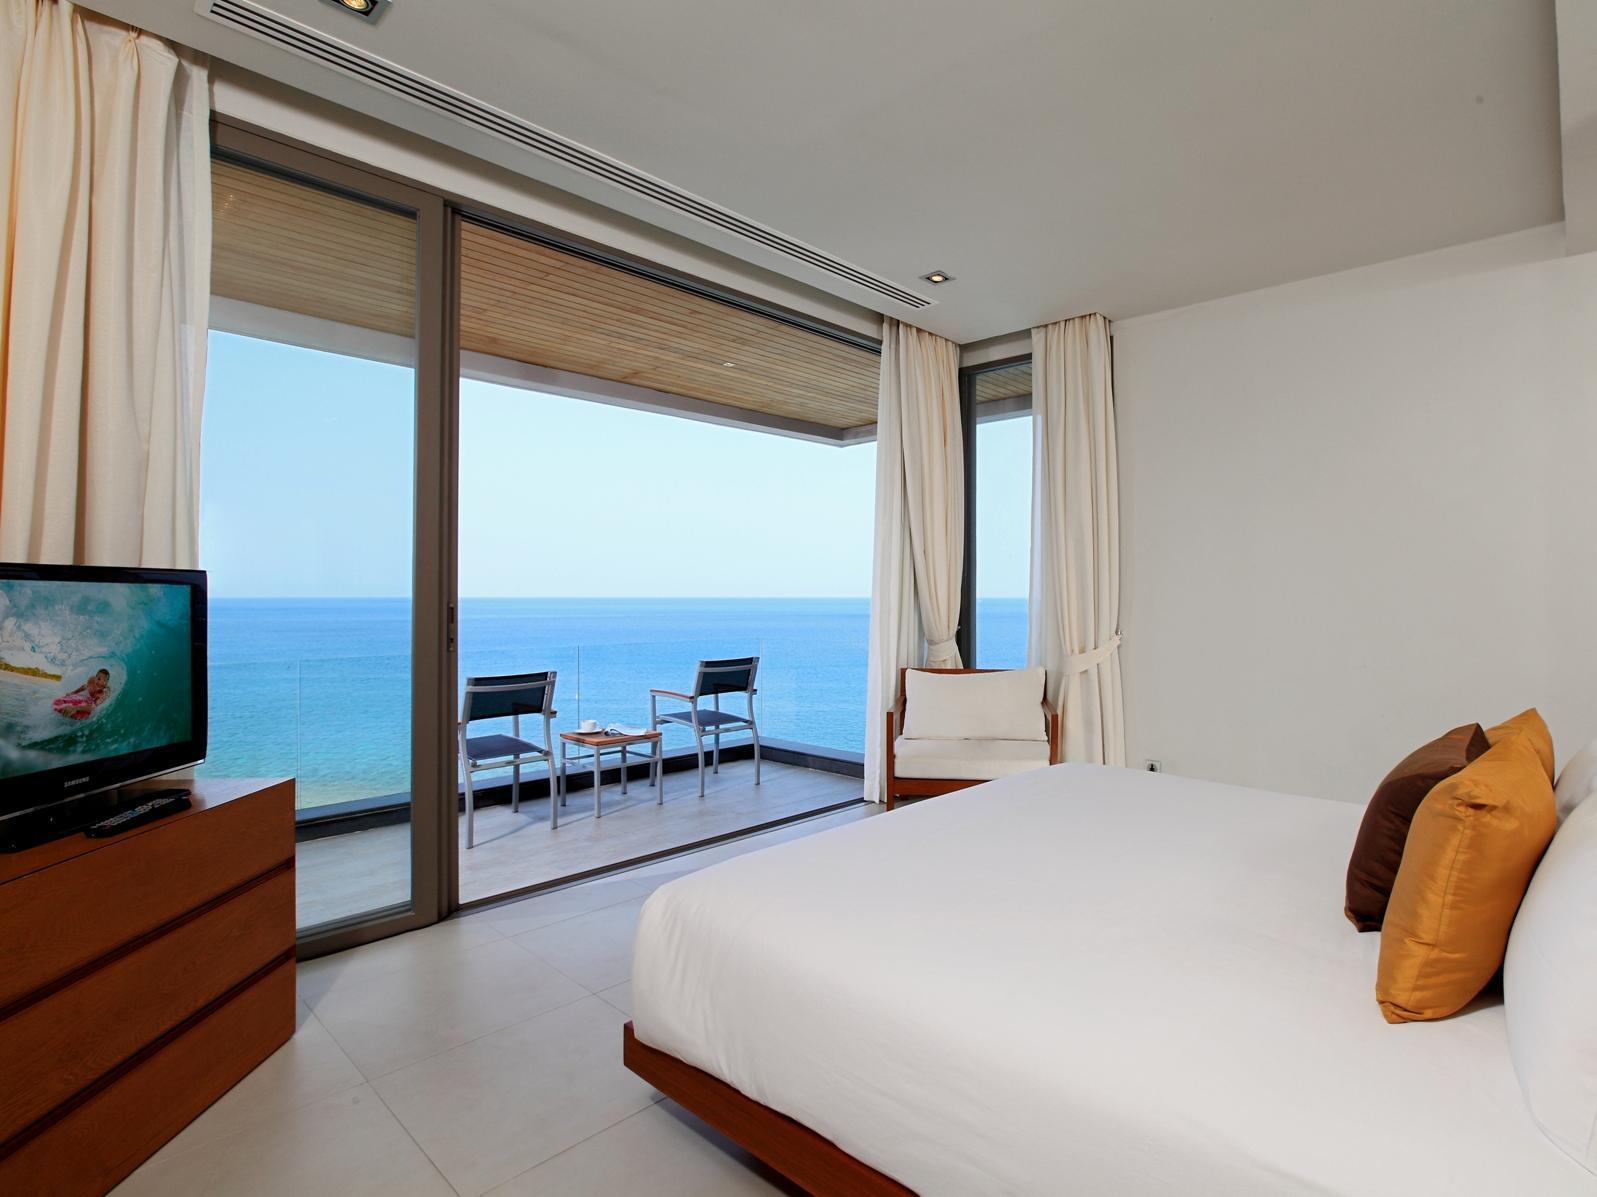 Cape Sienna Phuket Hotel and Villas17